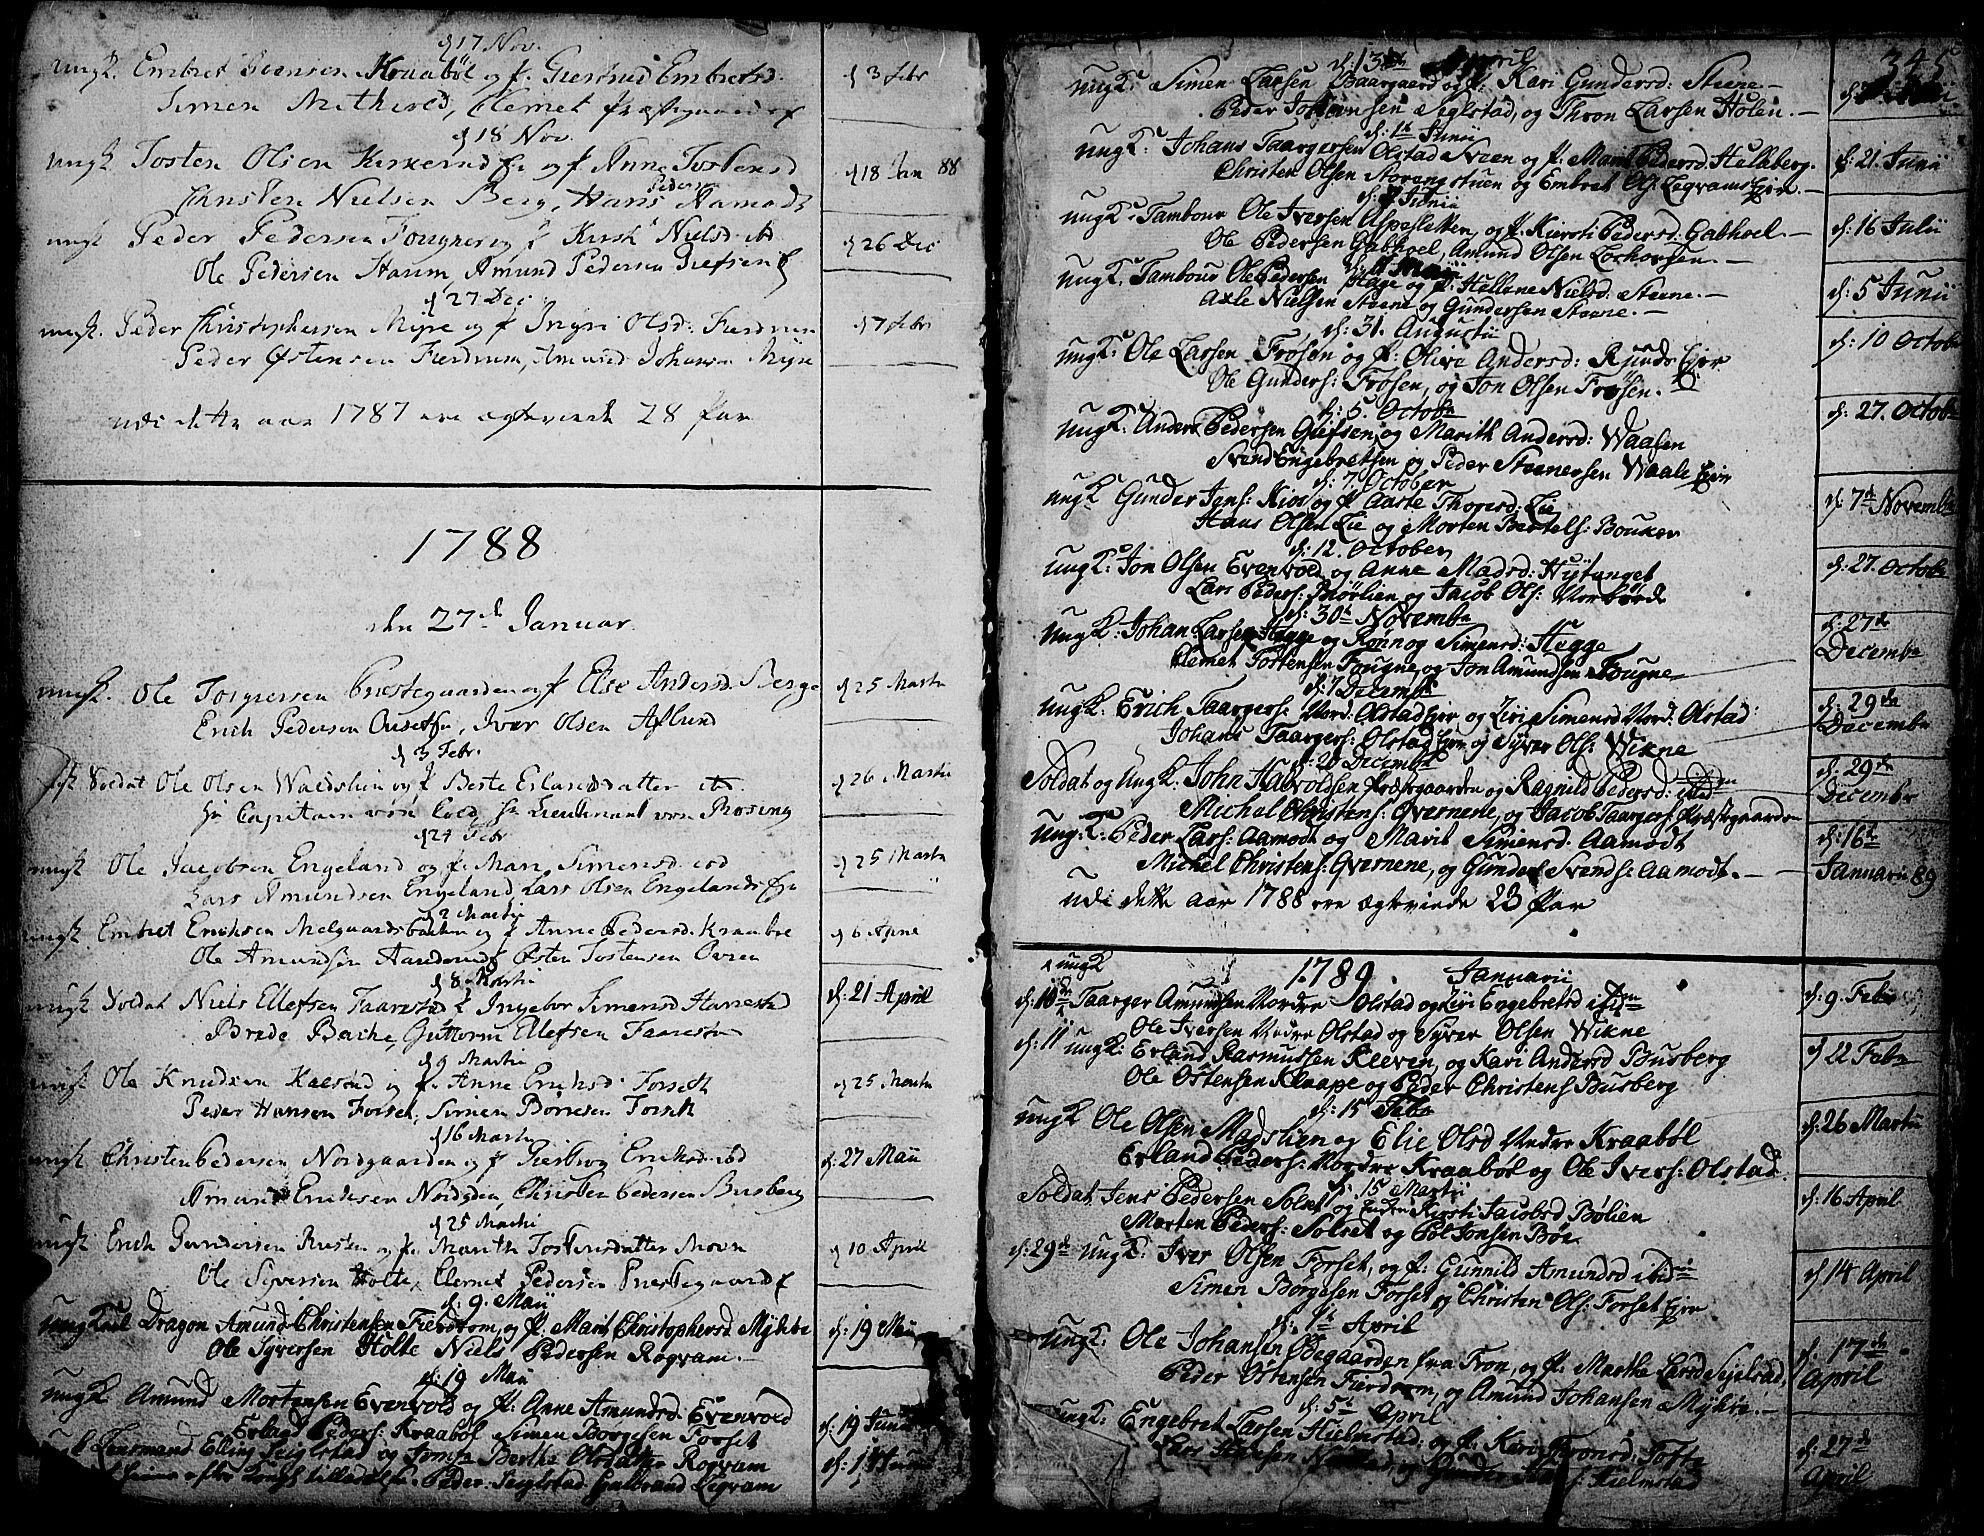 SAH, Gausdal prestekontor, Ministerialbok nr. 3, 1758-1809, s. 345